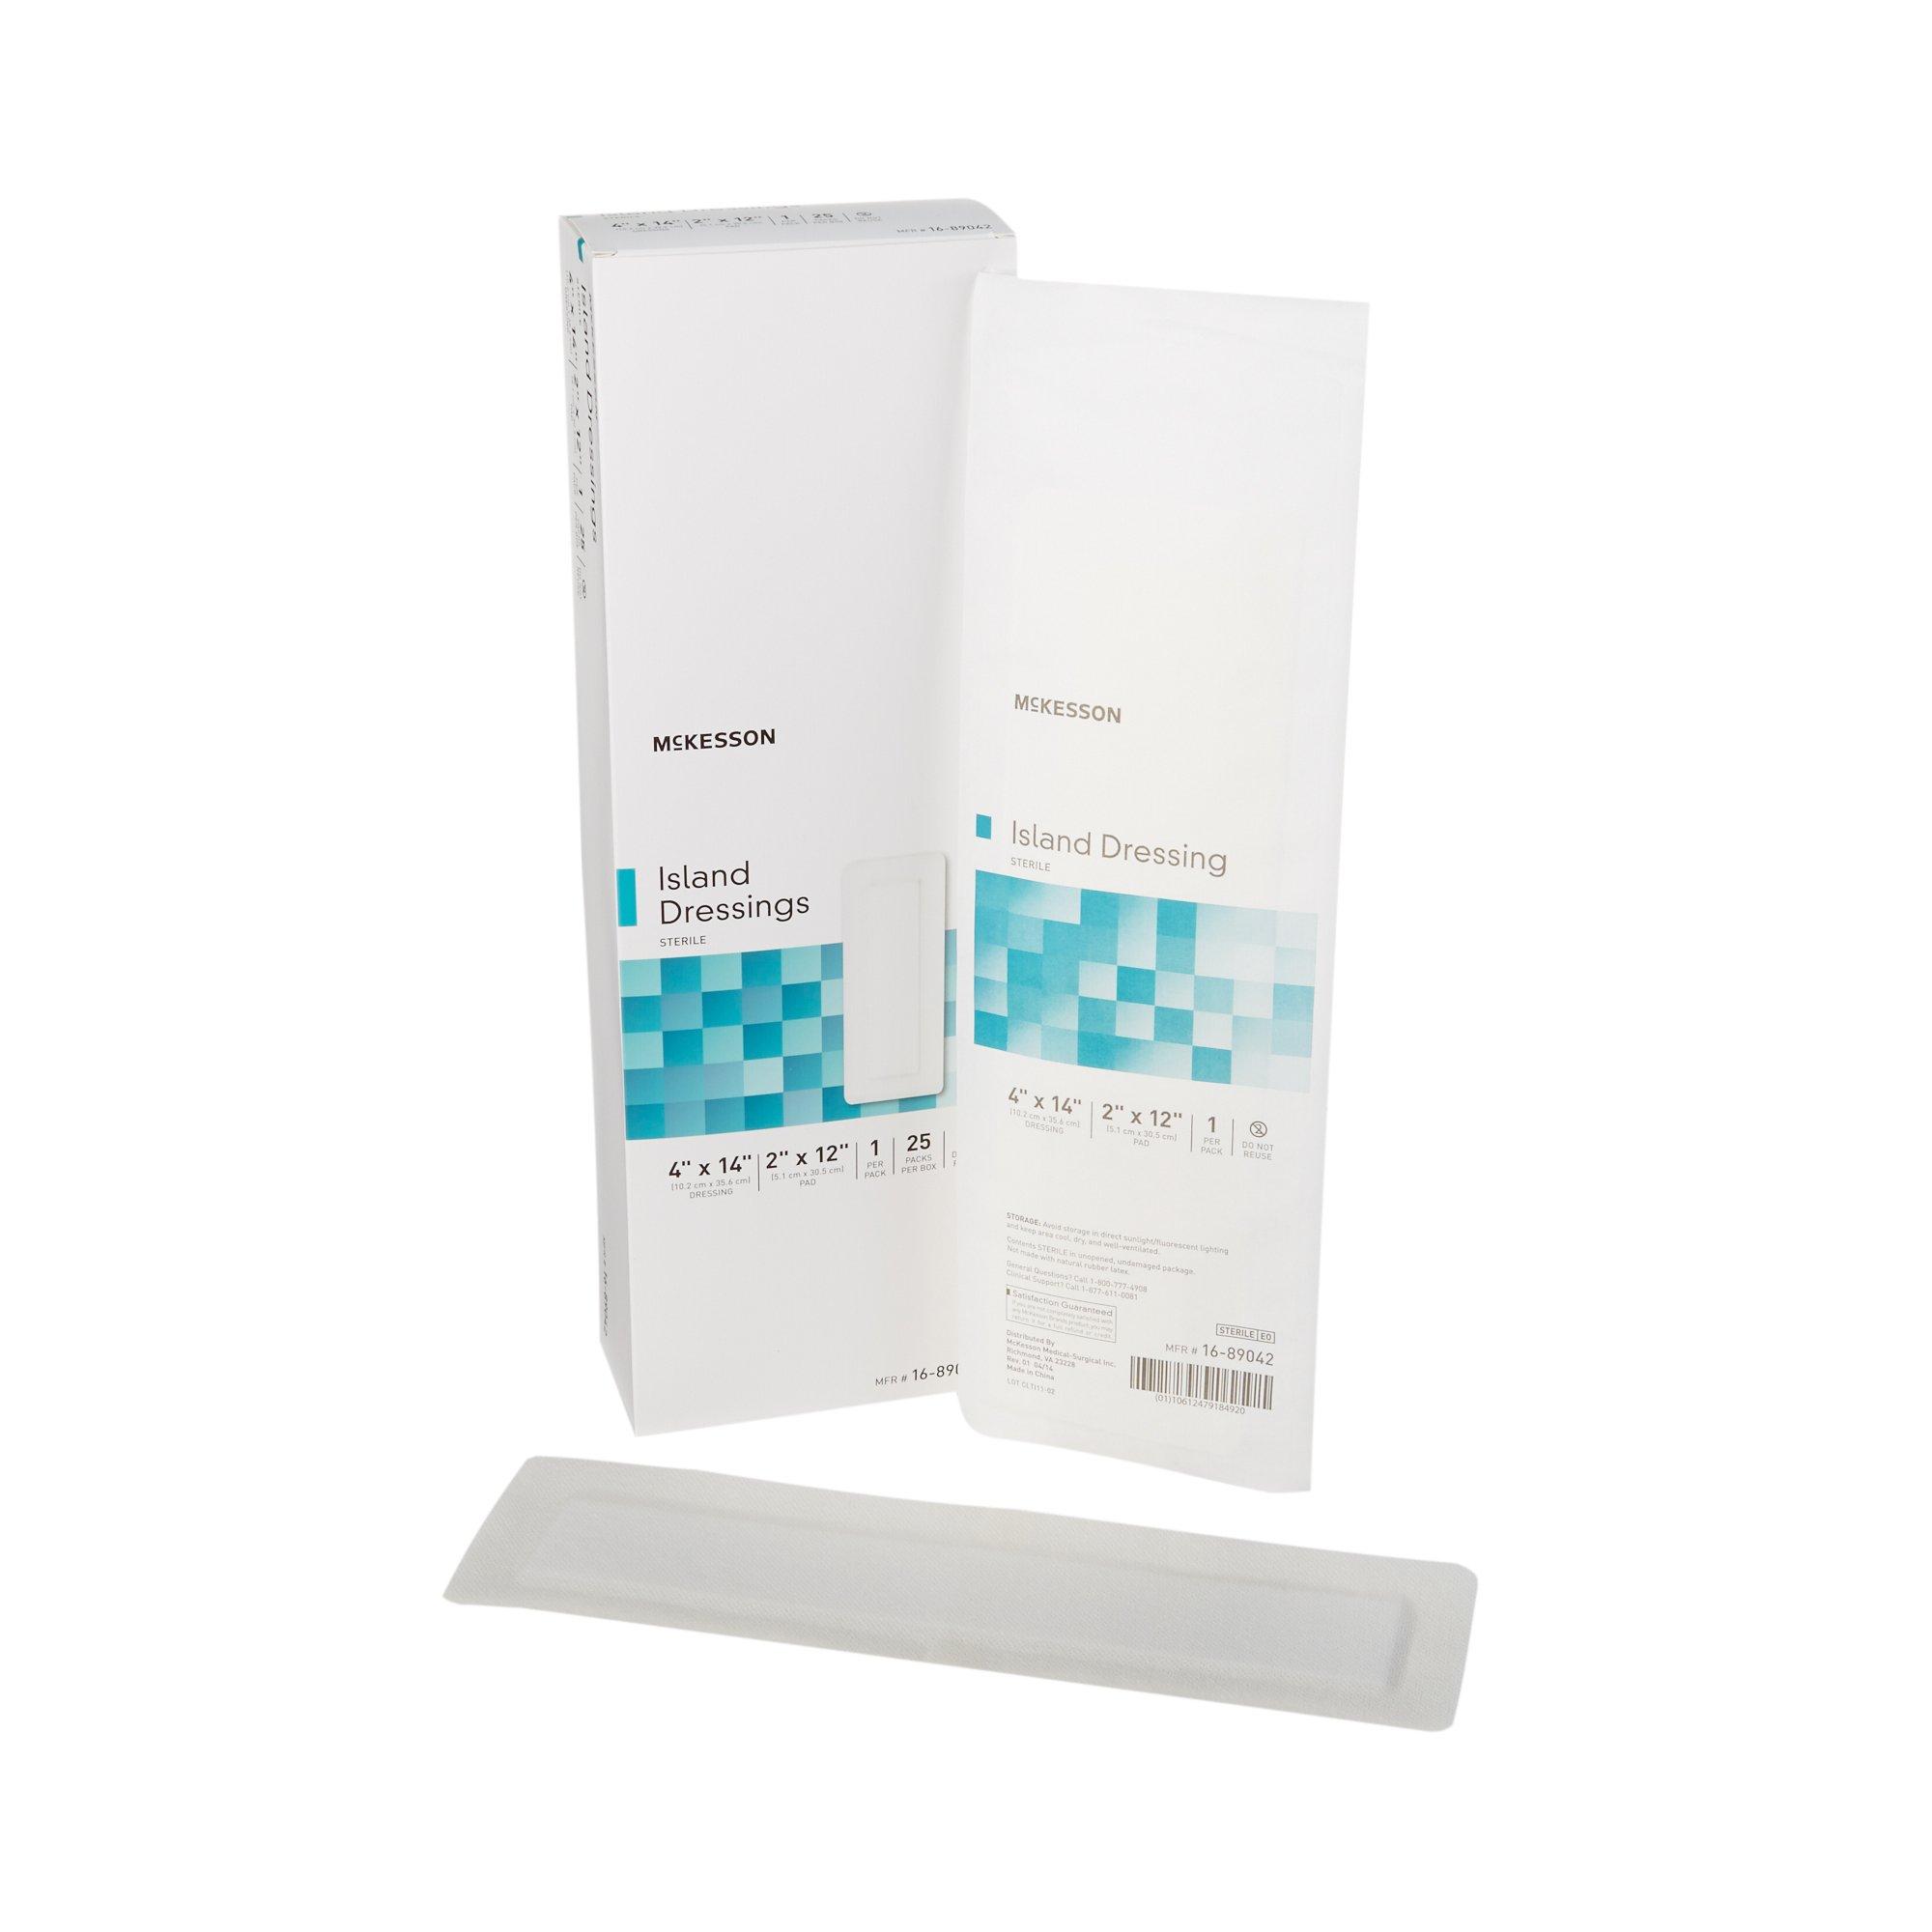 Box McKesson Sterile Adhesive Dressing Square 2 X 2  Pad 16-89044 25